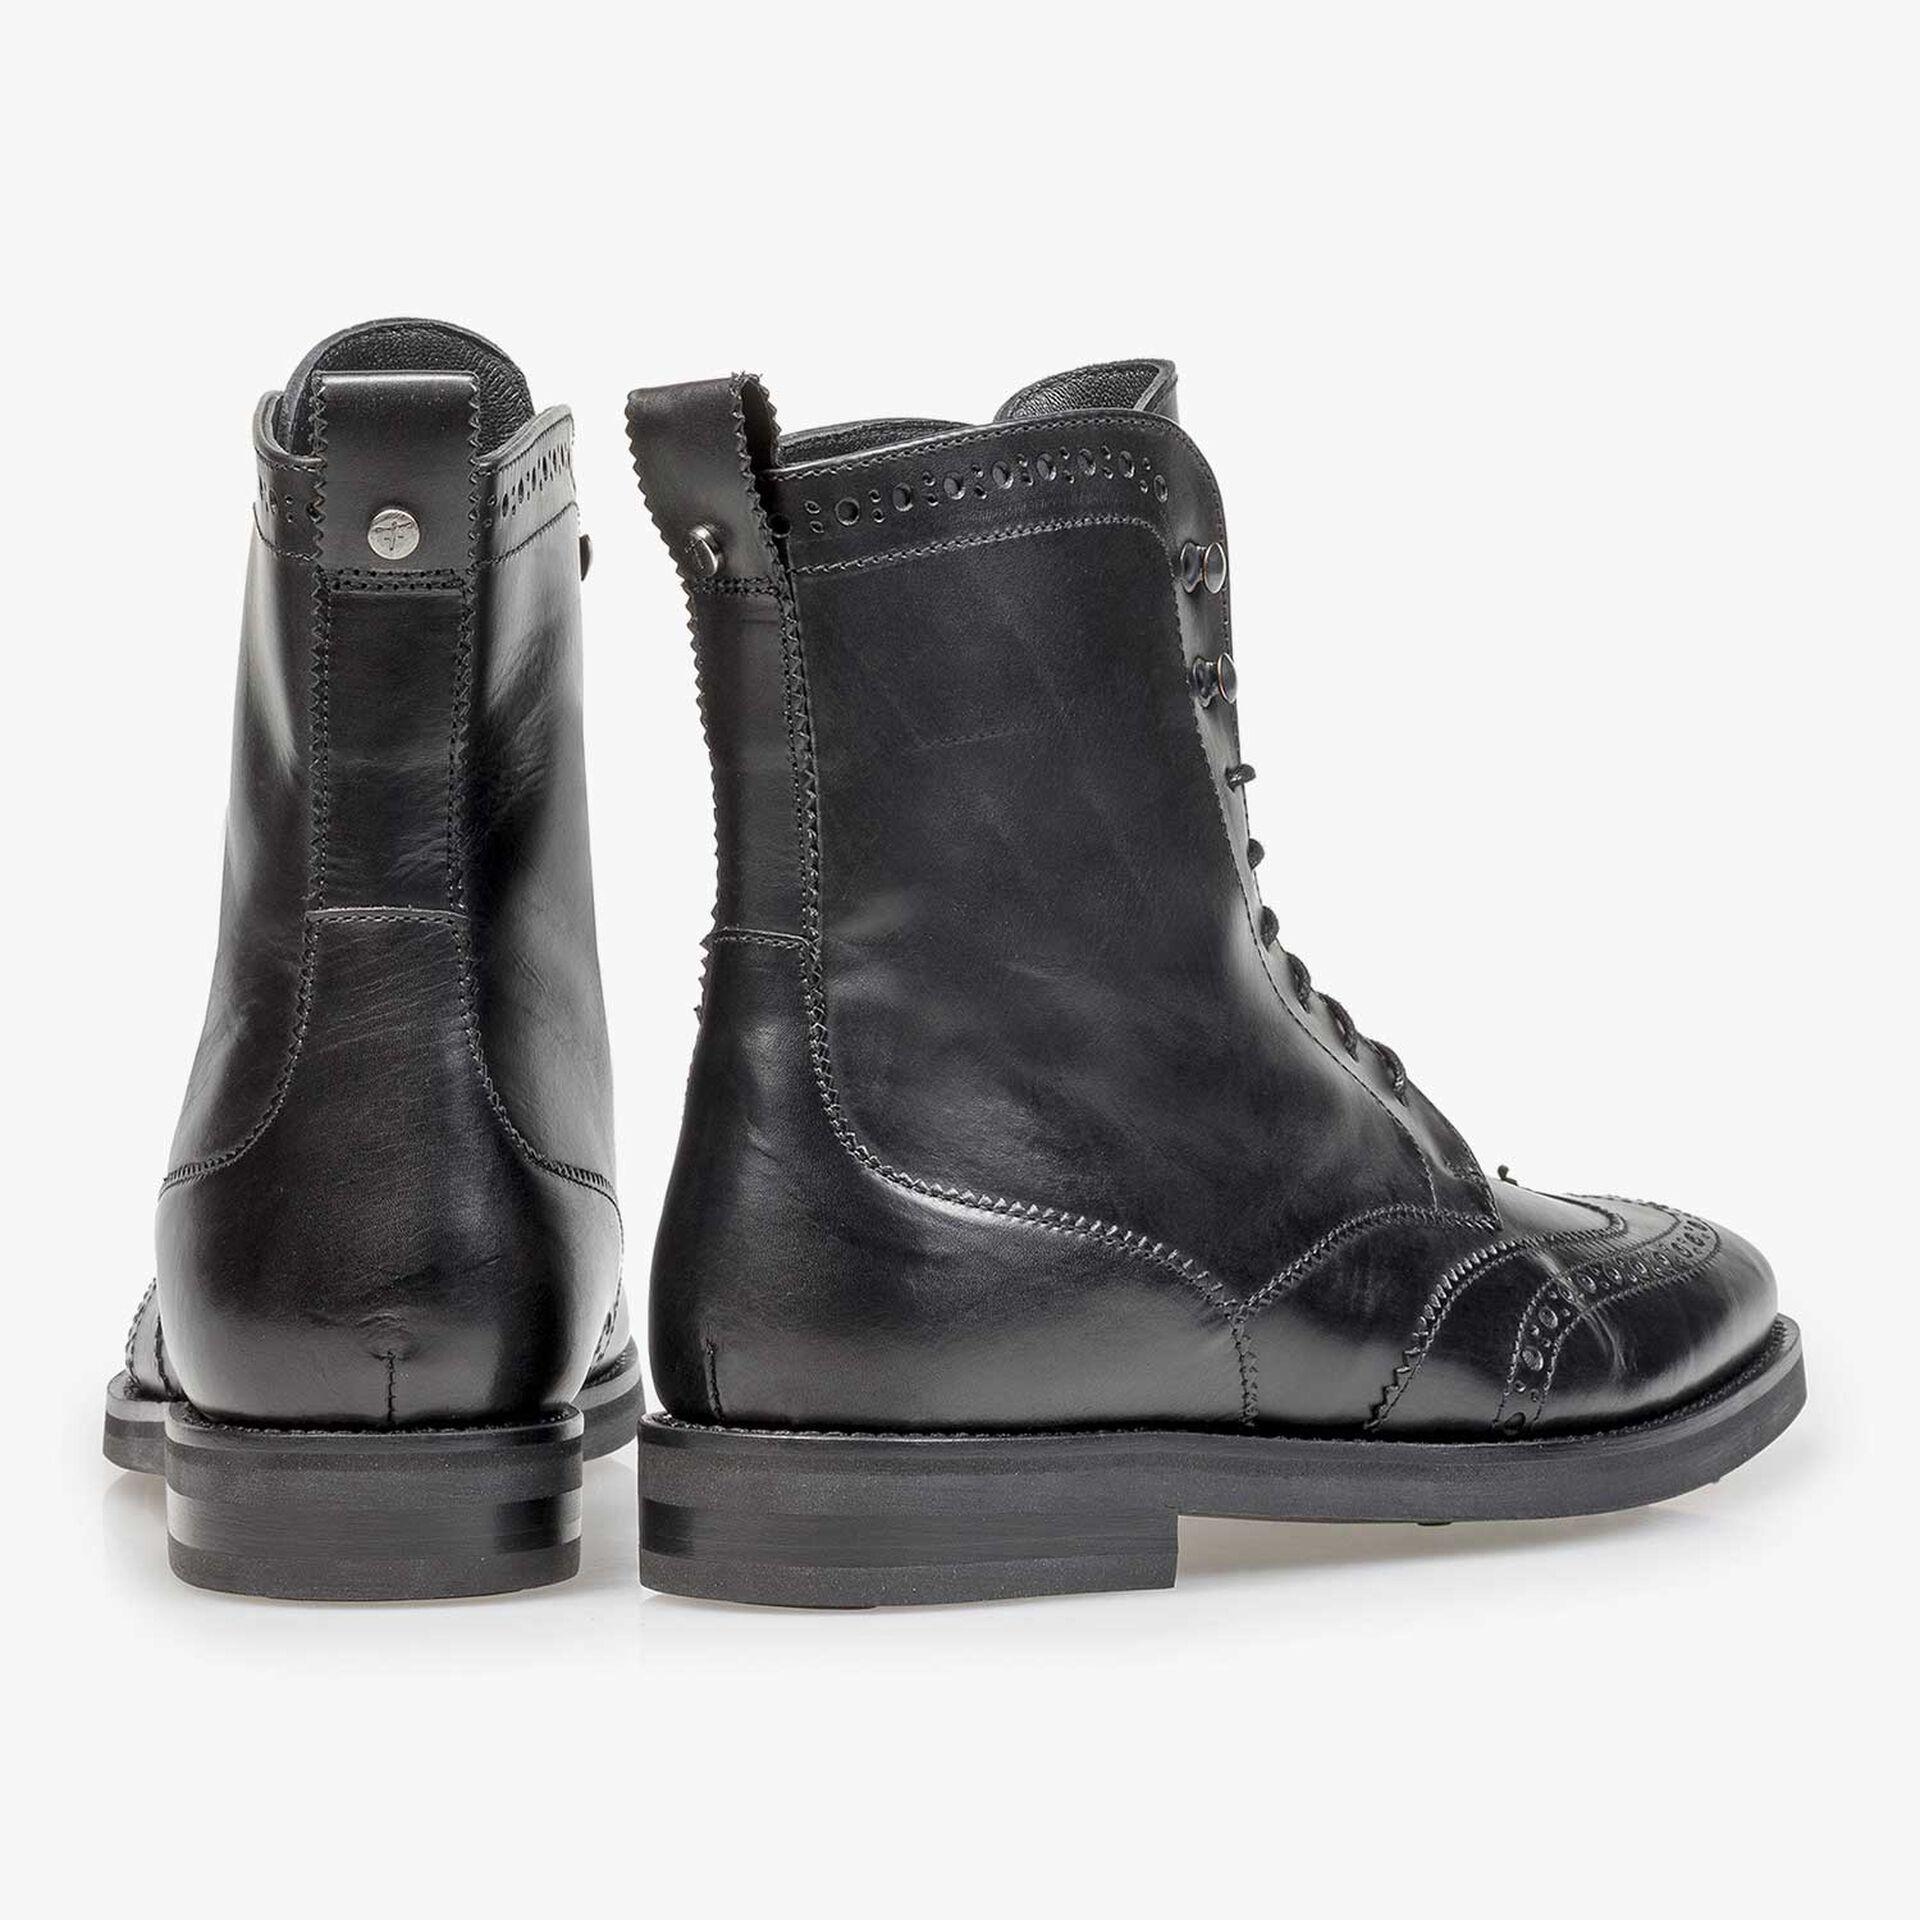 Black calf leather biker lace boot